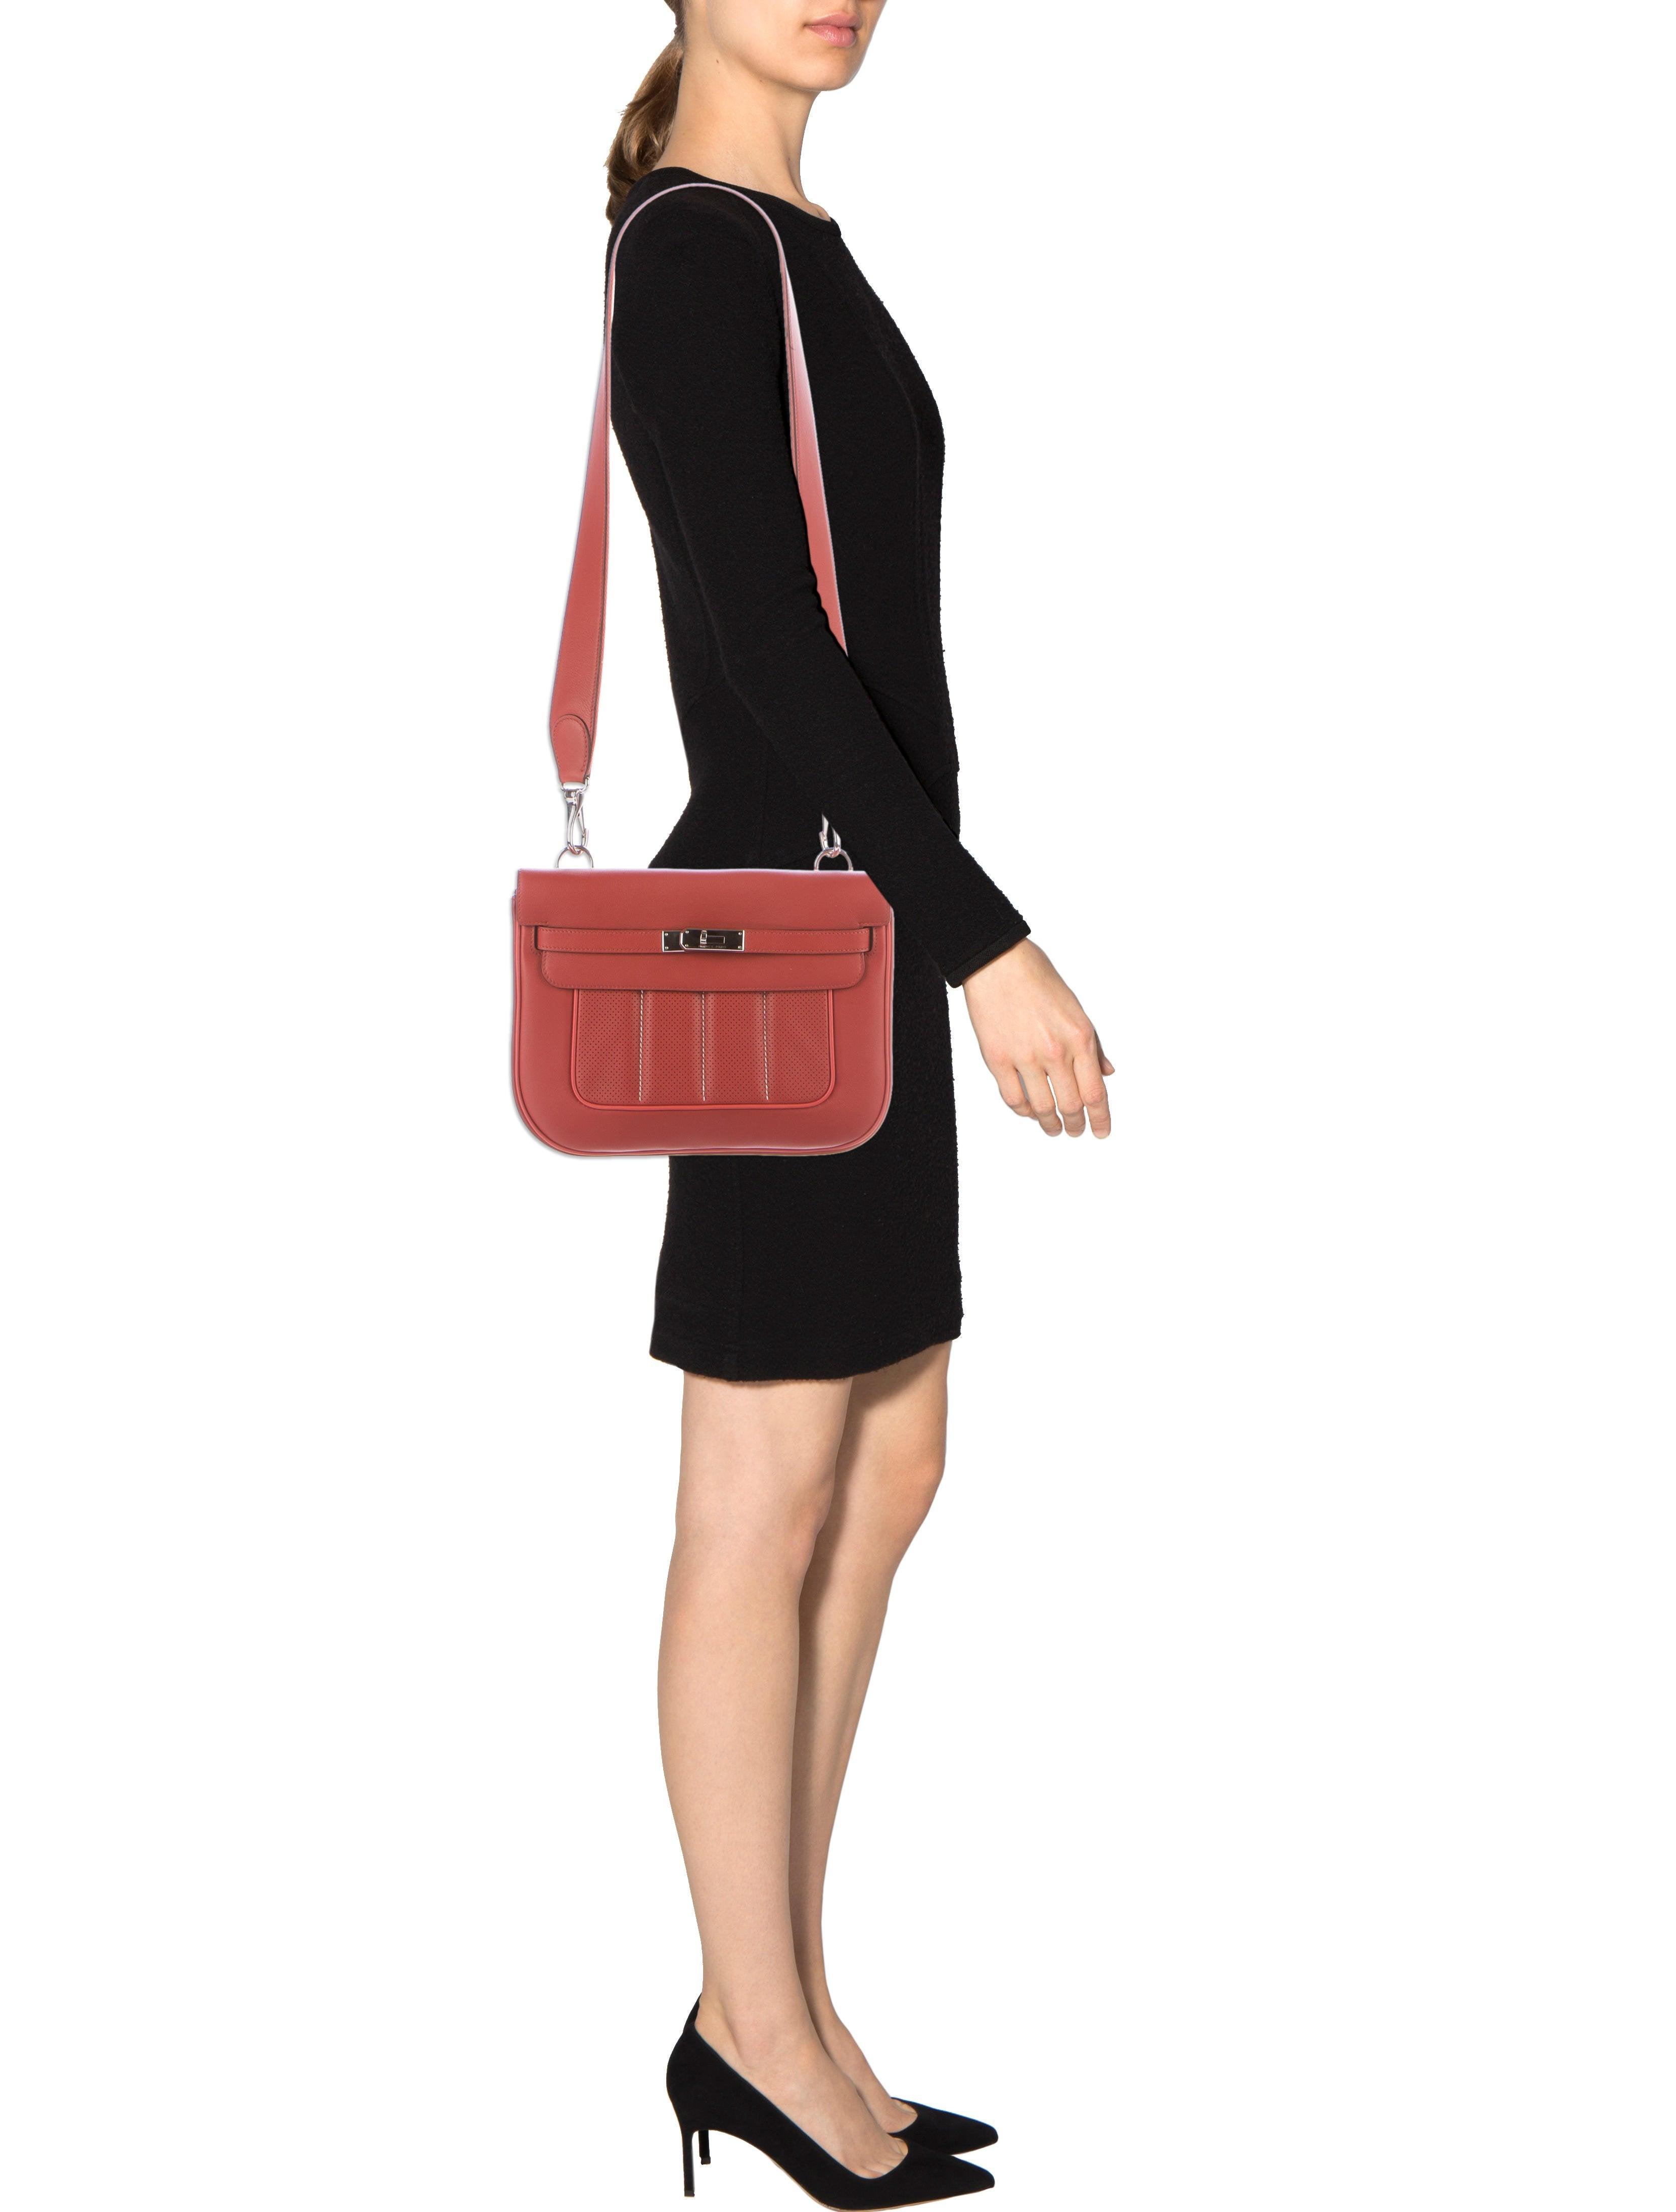 herm s swift berline 28 handbags her93951 the realreal. Black Bedroom Furniture Sets. Home Design Ideas